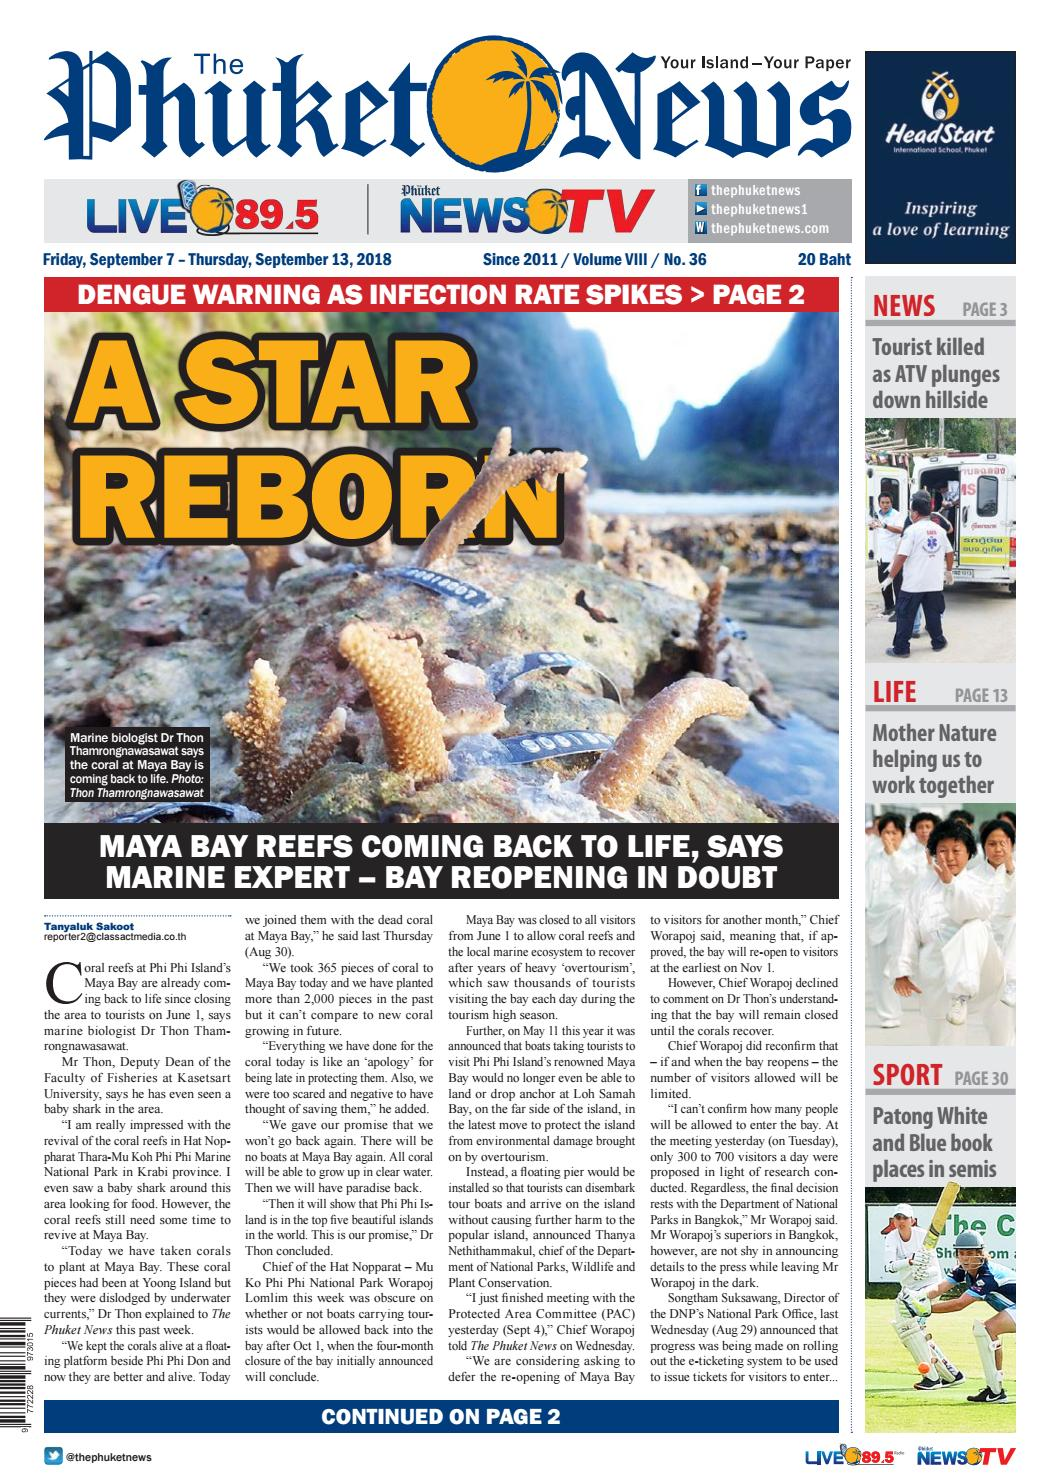 The Phuket News 07 September 2018 by The Phuket News - issuu